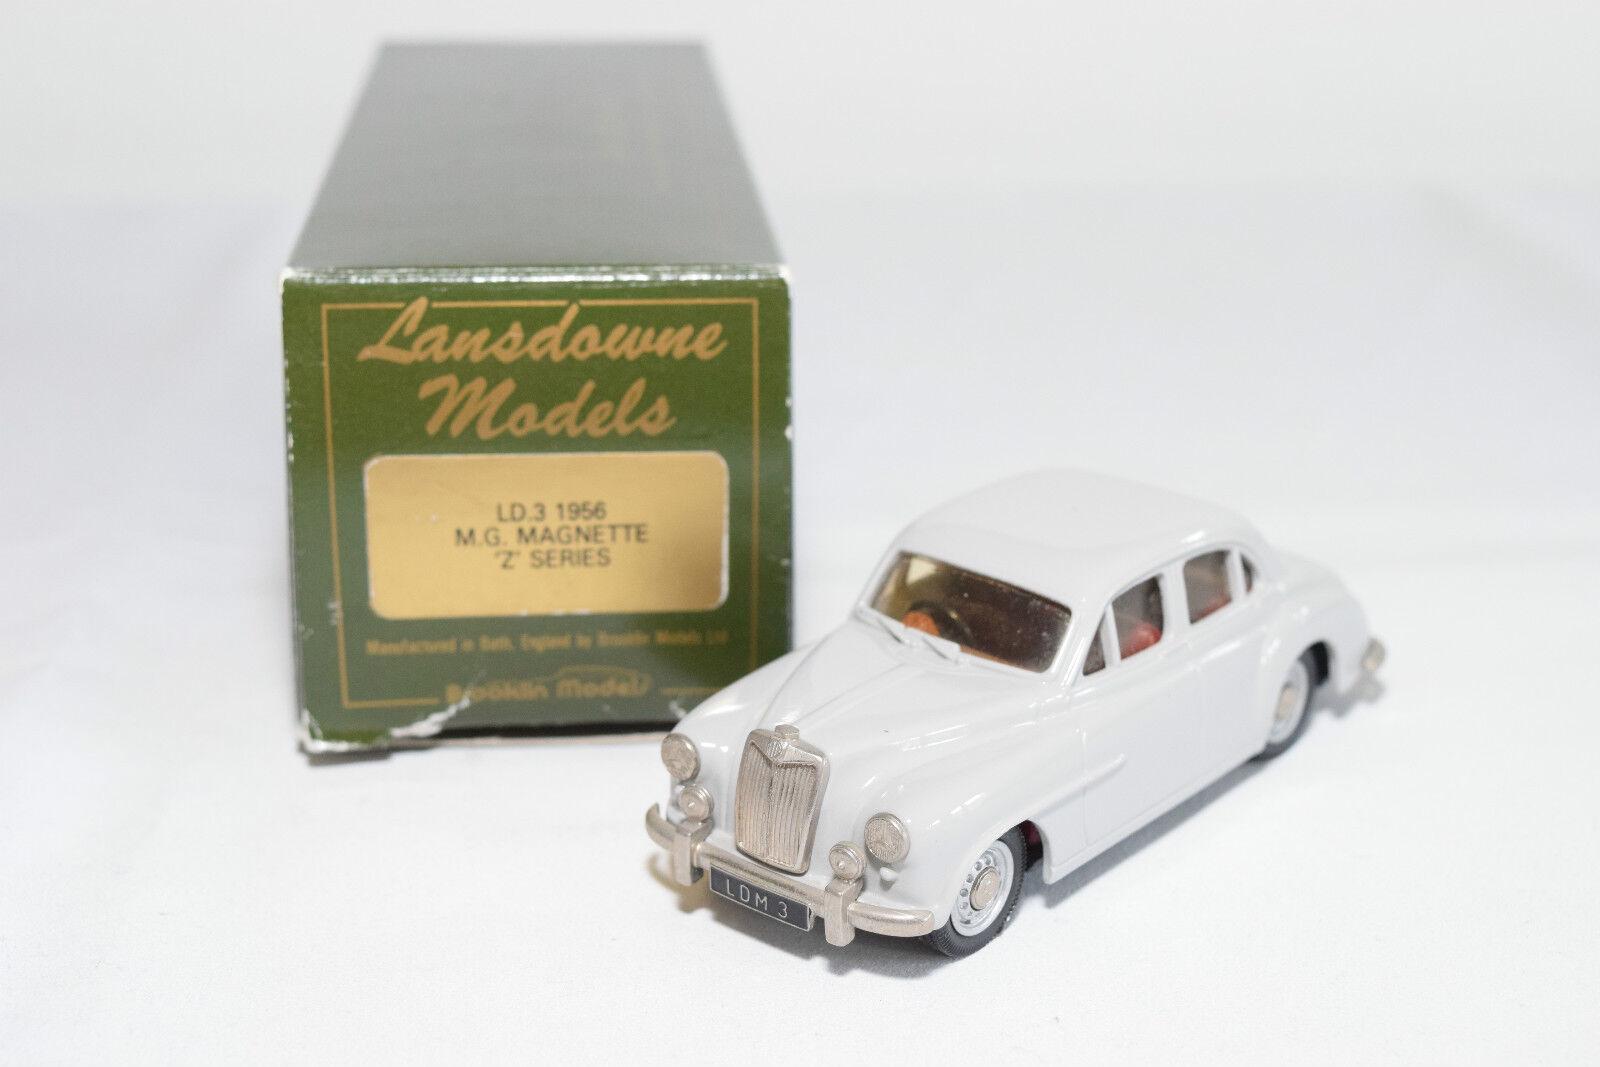 .. LANSDOWNE MODELS LDM 3 M.G. MAGNETTE Z SERIES 1956 GREY MINT BOXED